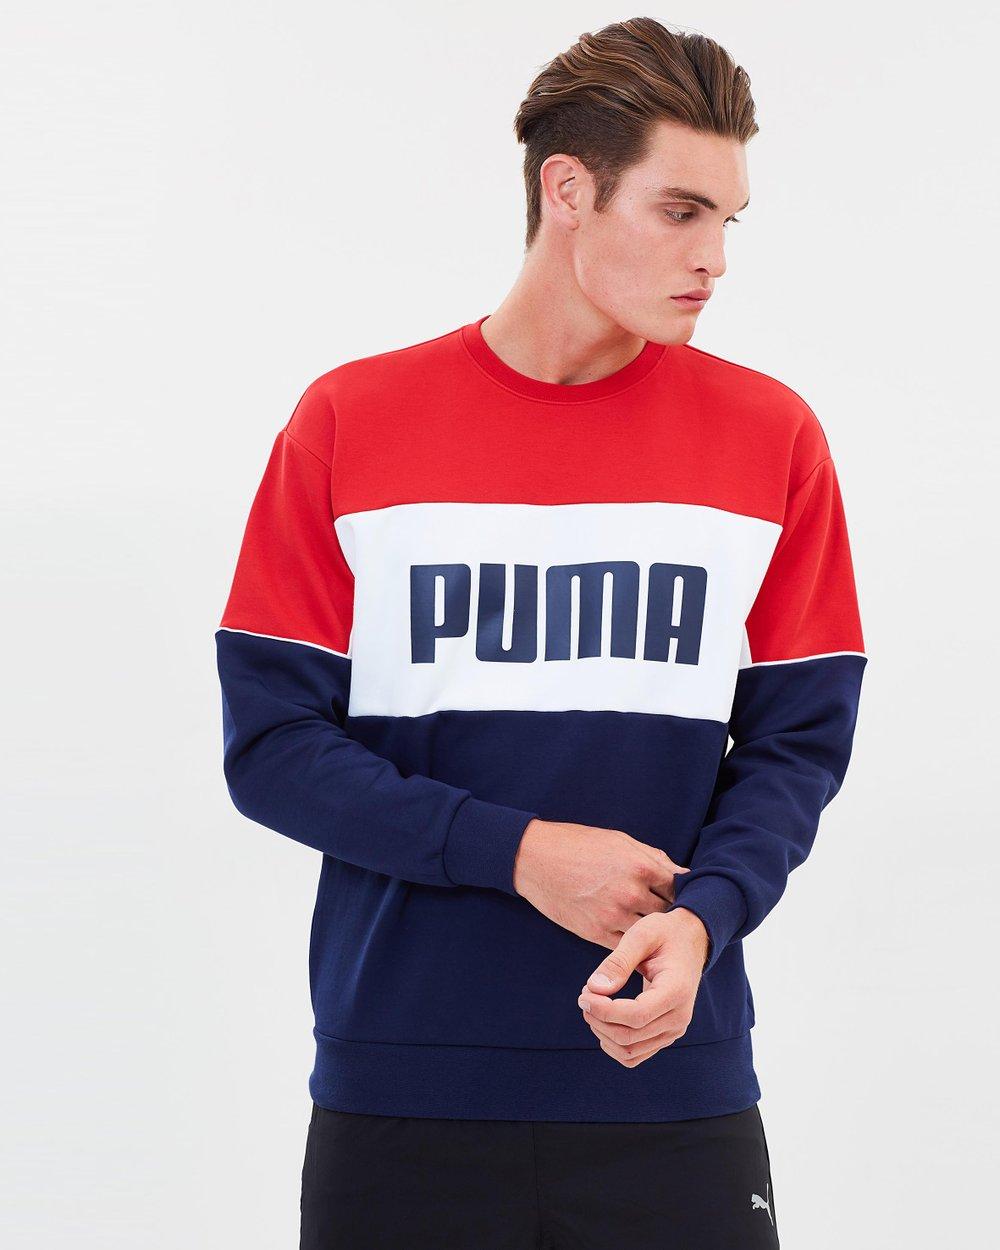 6d164fb3a17461 Retro Crew by Puma Online